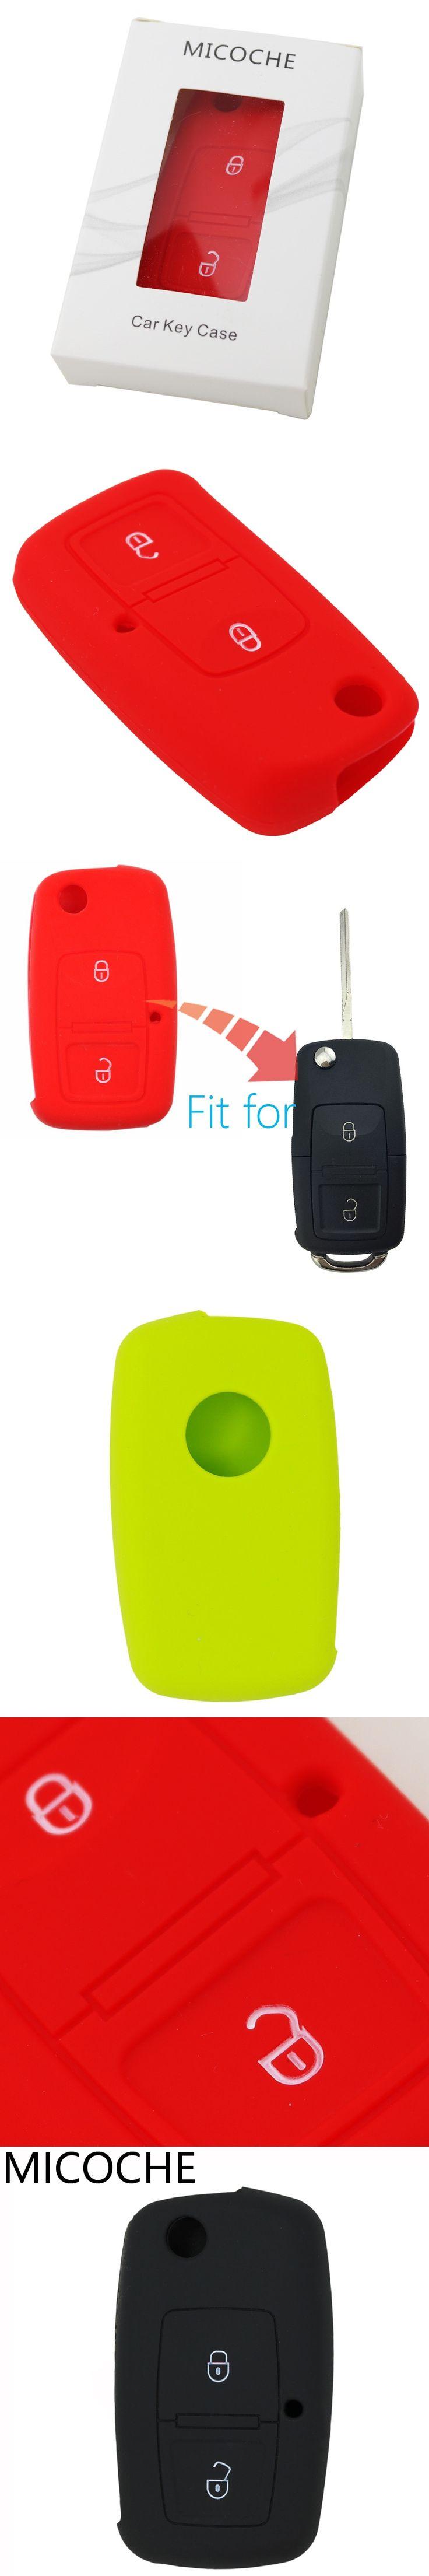 1pc 2 button Car Key Case Cover For VOLKSWAGEN Vw MK4 Seat Altea Alhambra Ibiza Polo Golf 4 5 6 Transporter Amarok Sharan